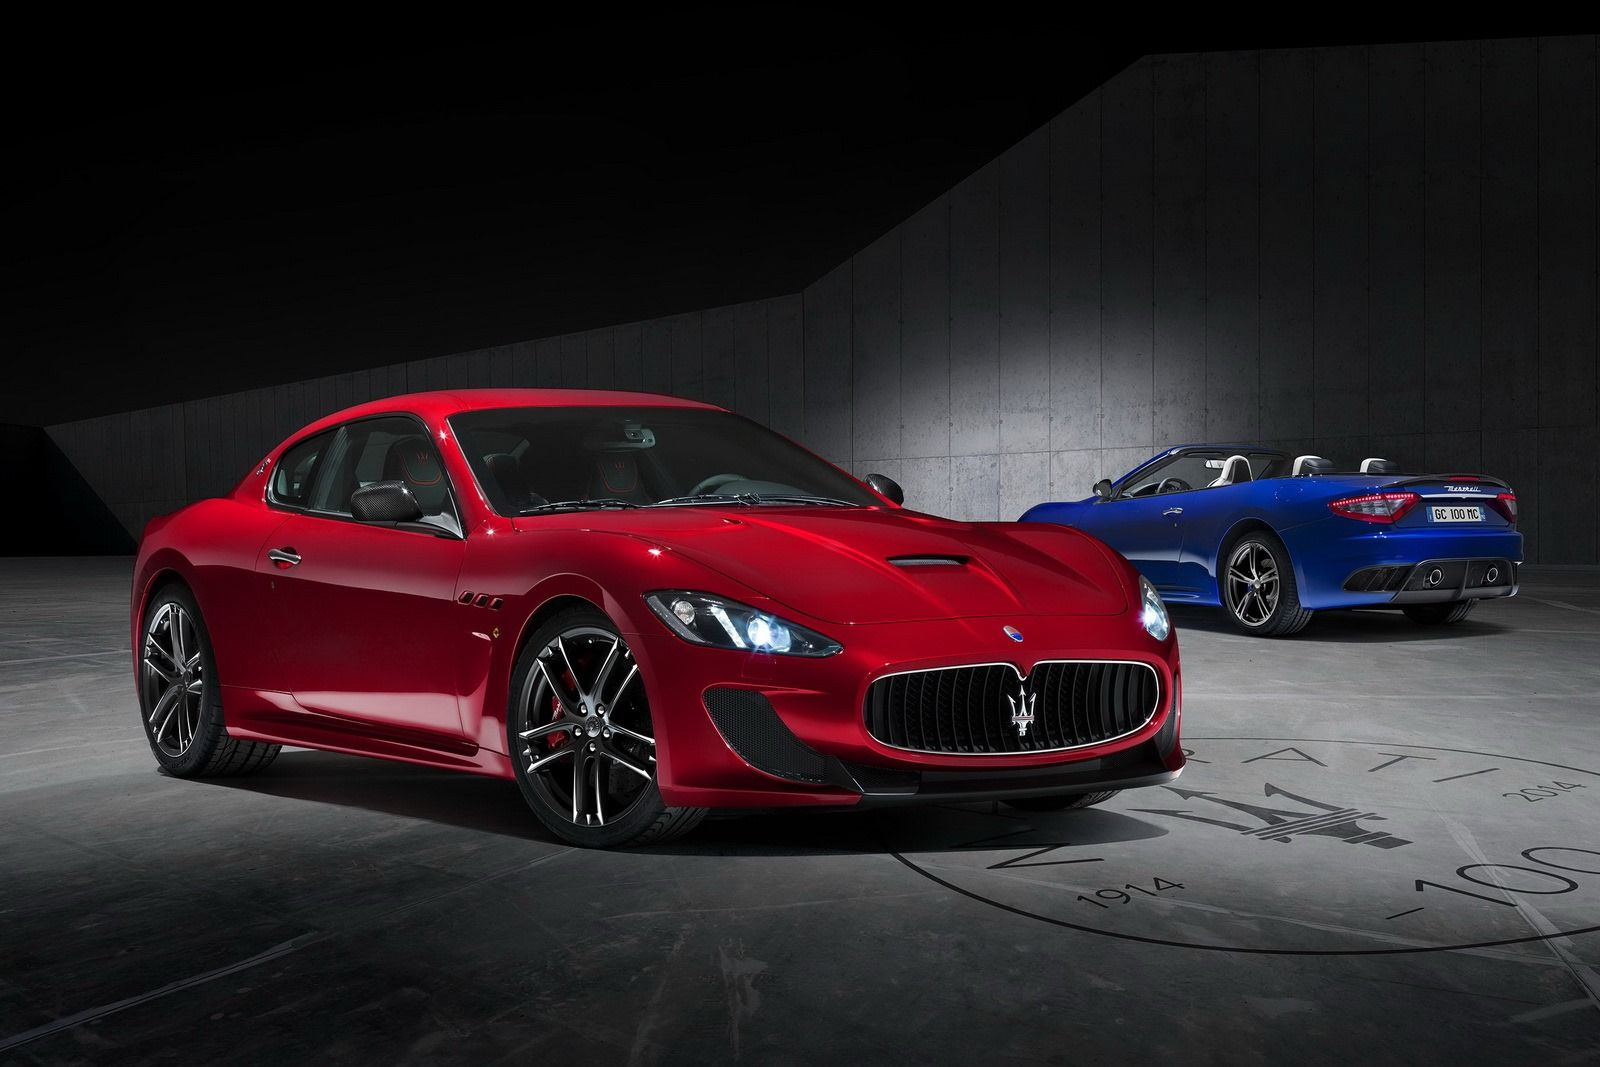 2019 Maserati Alfieri Price And Release Date Awesome 2019 Maserati